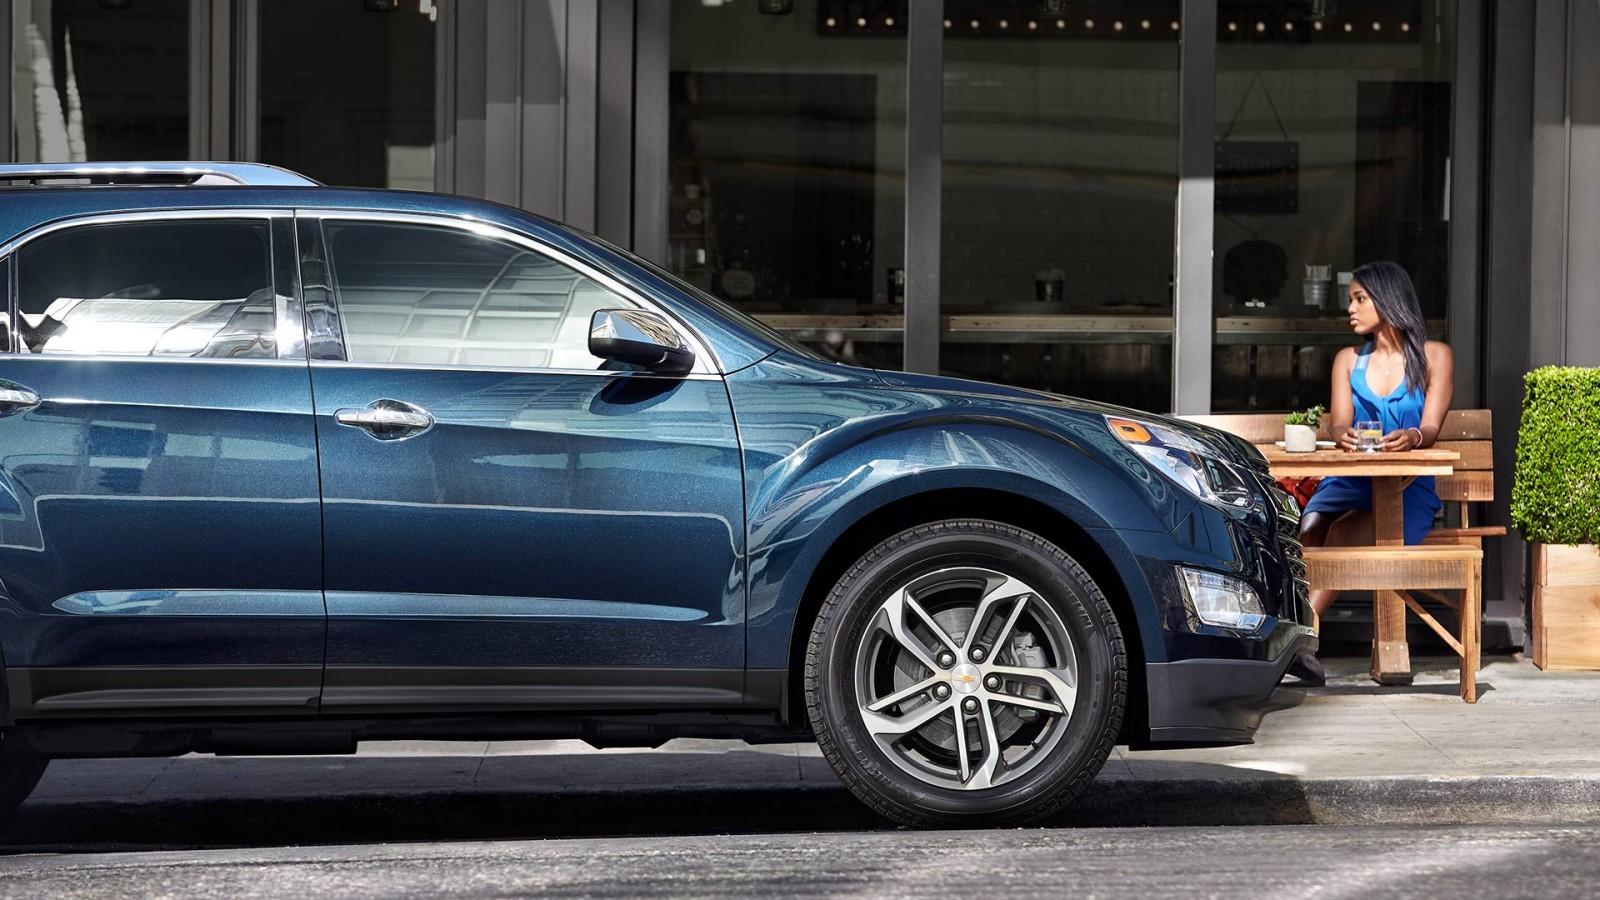 New Chevrolet Equinox Exterior image 1